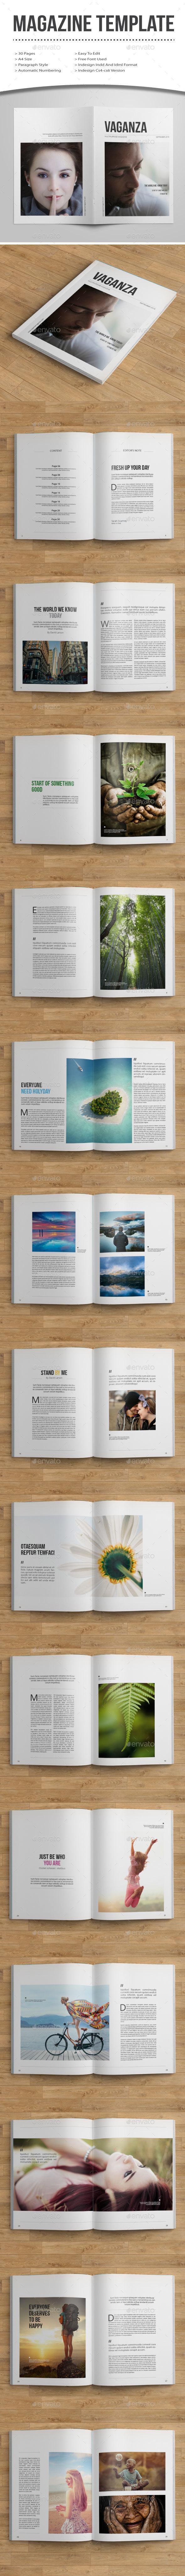 Minimal MagazineTemplate - Magazines Print Templates